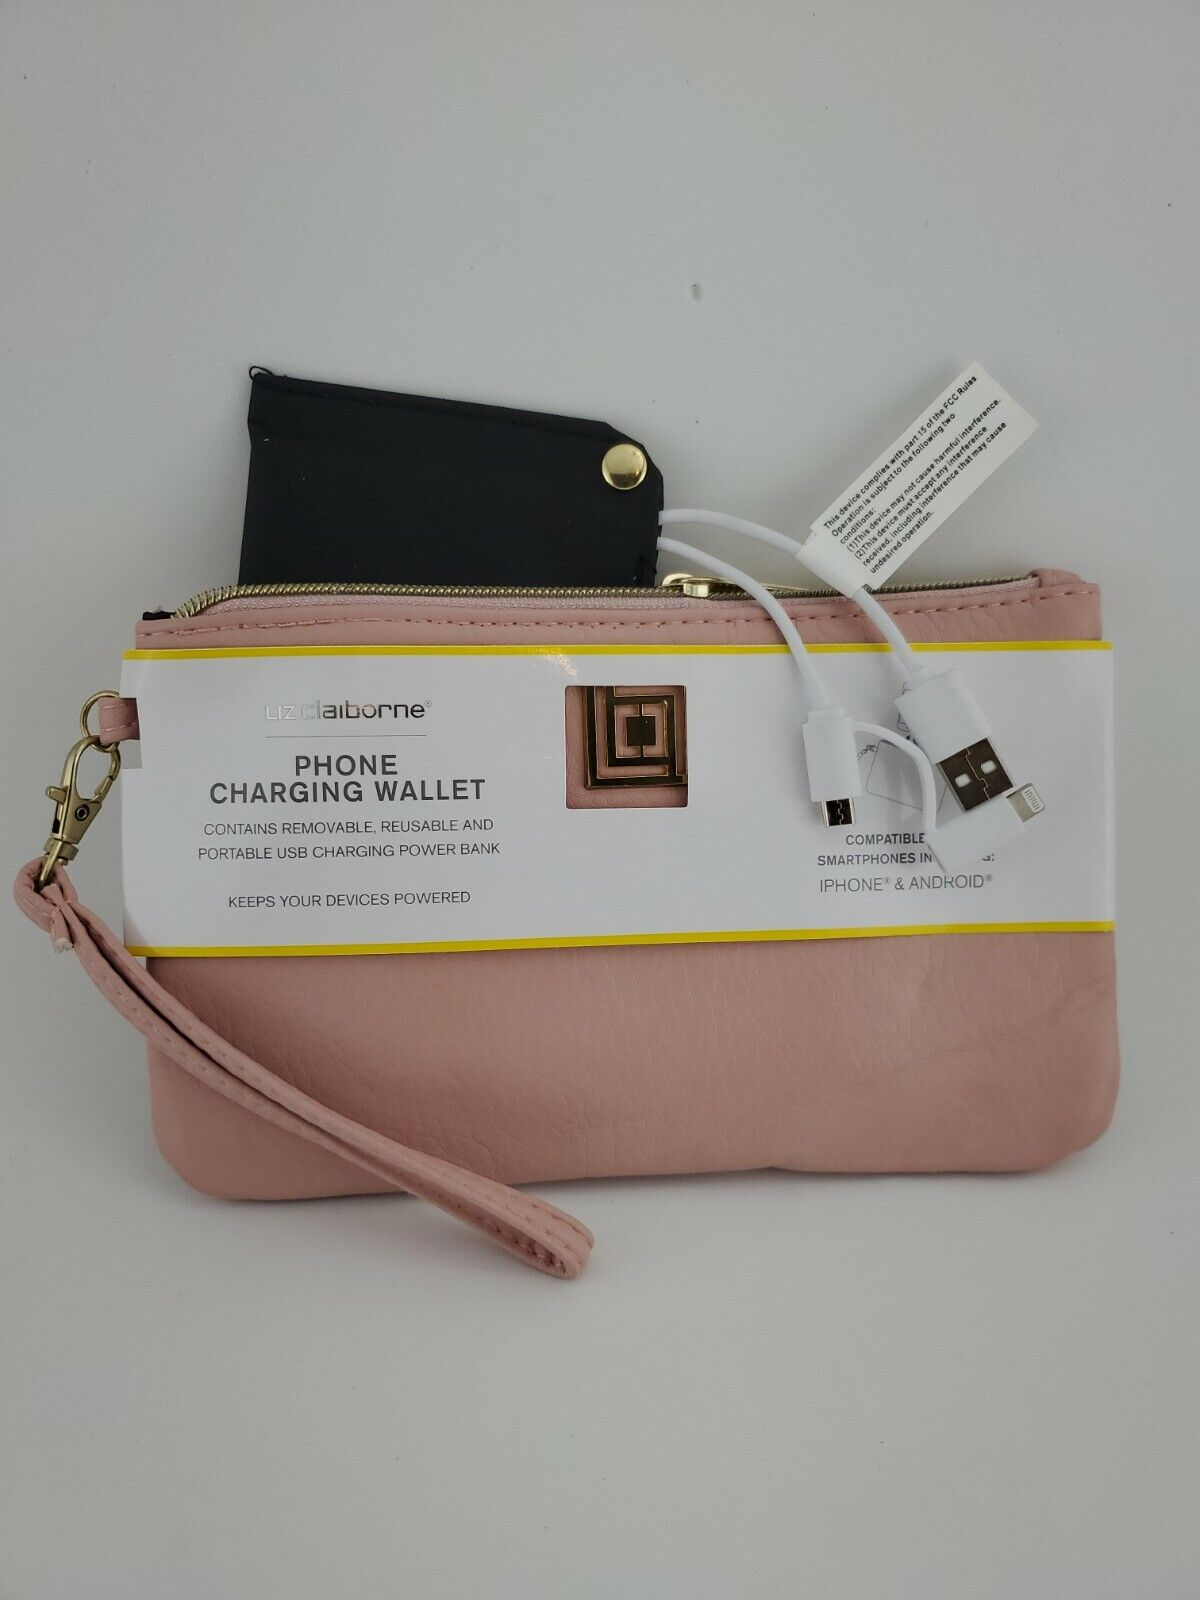 Liz Claiborne Phone Charging Wallet - Pink - Brand New Originally